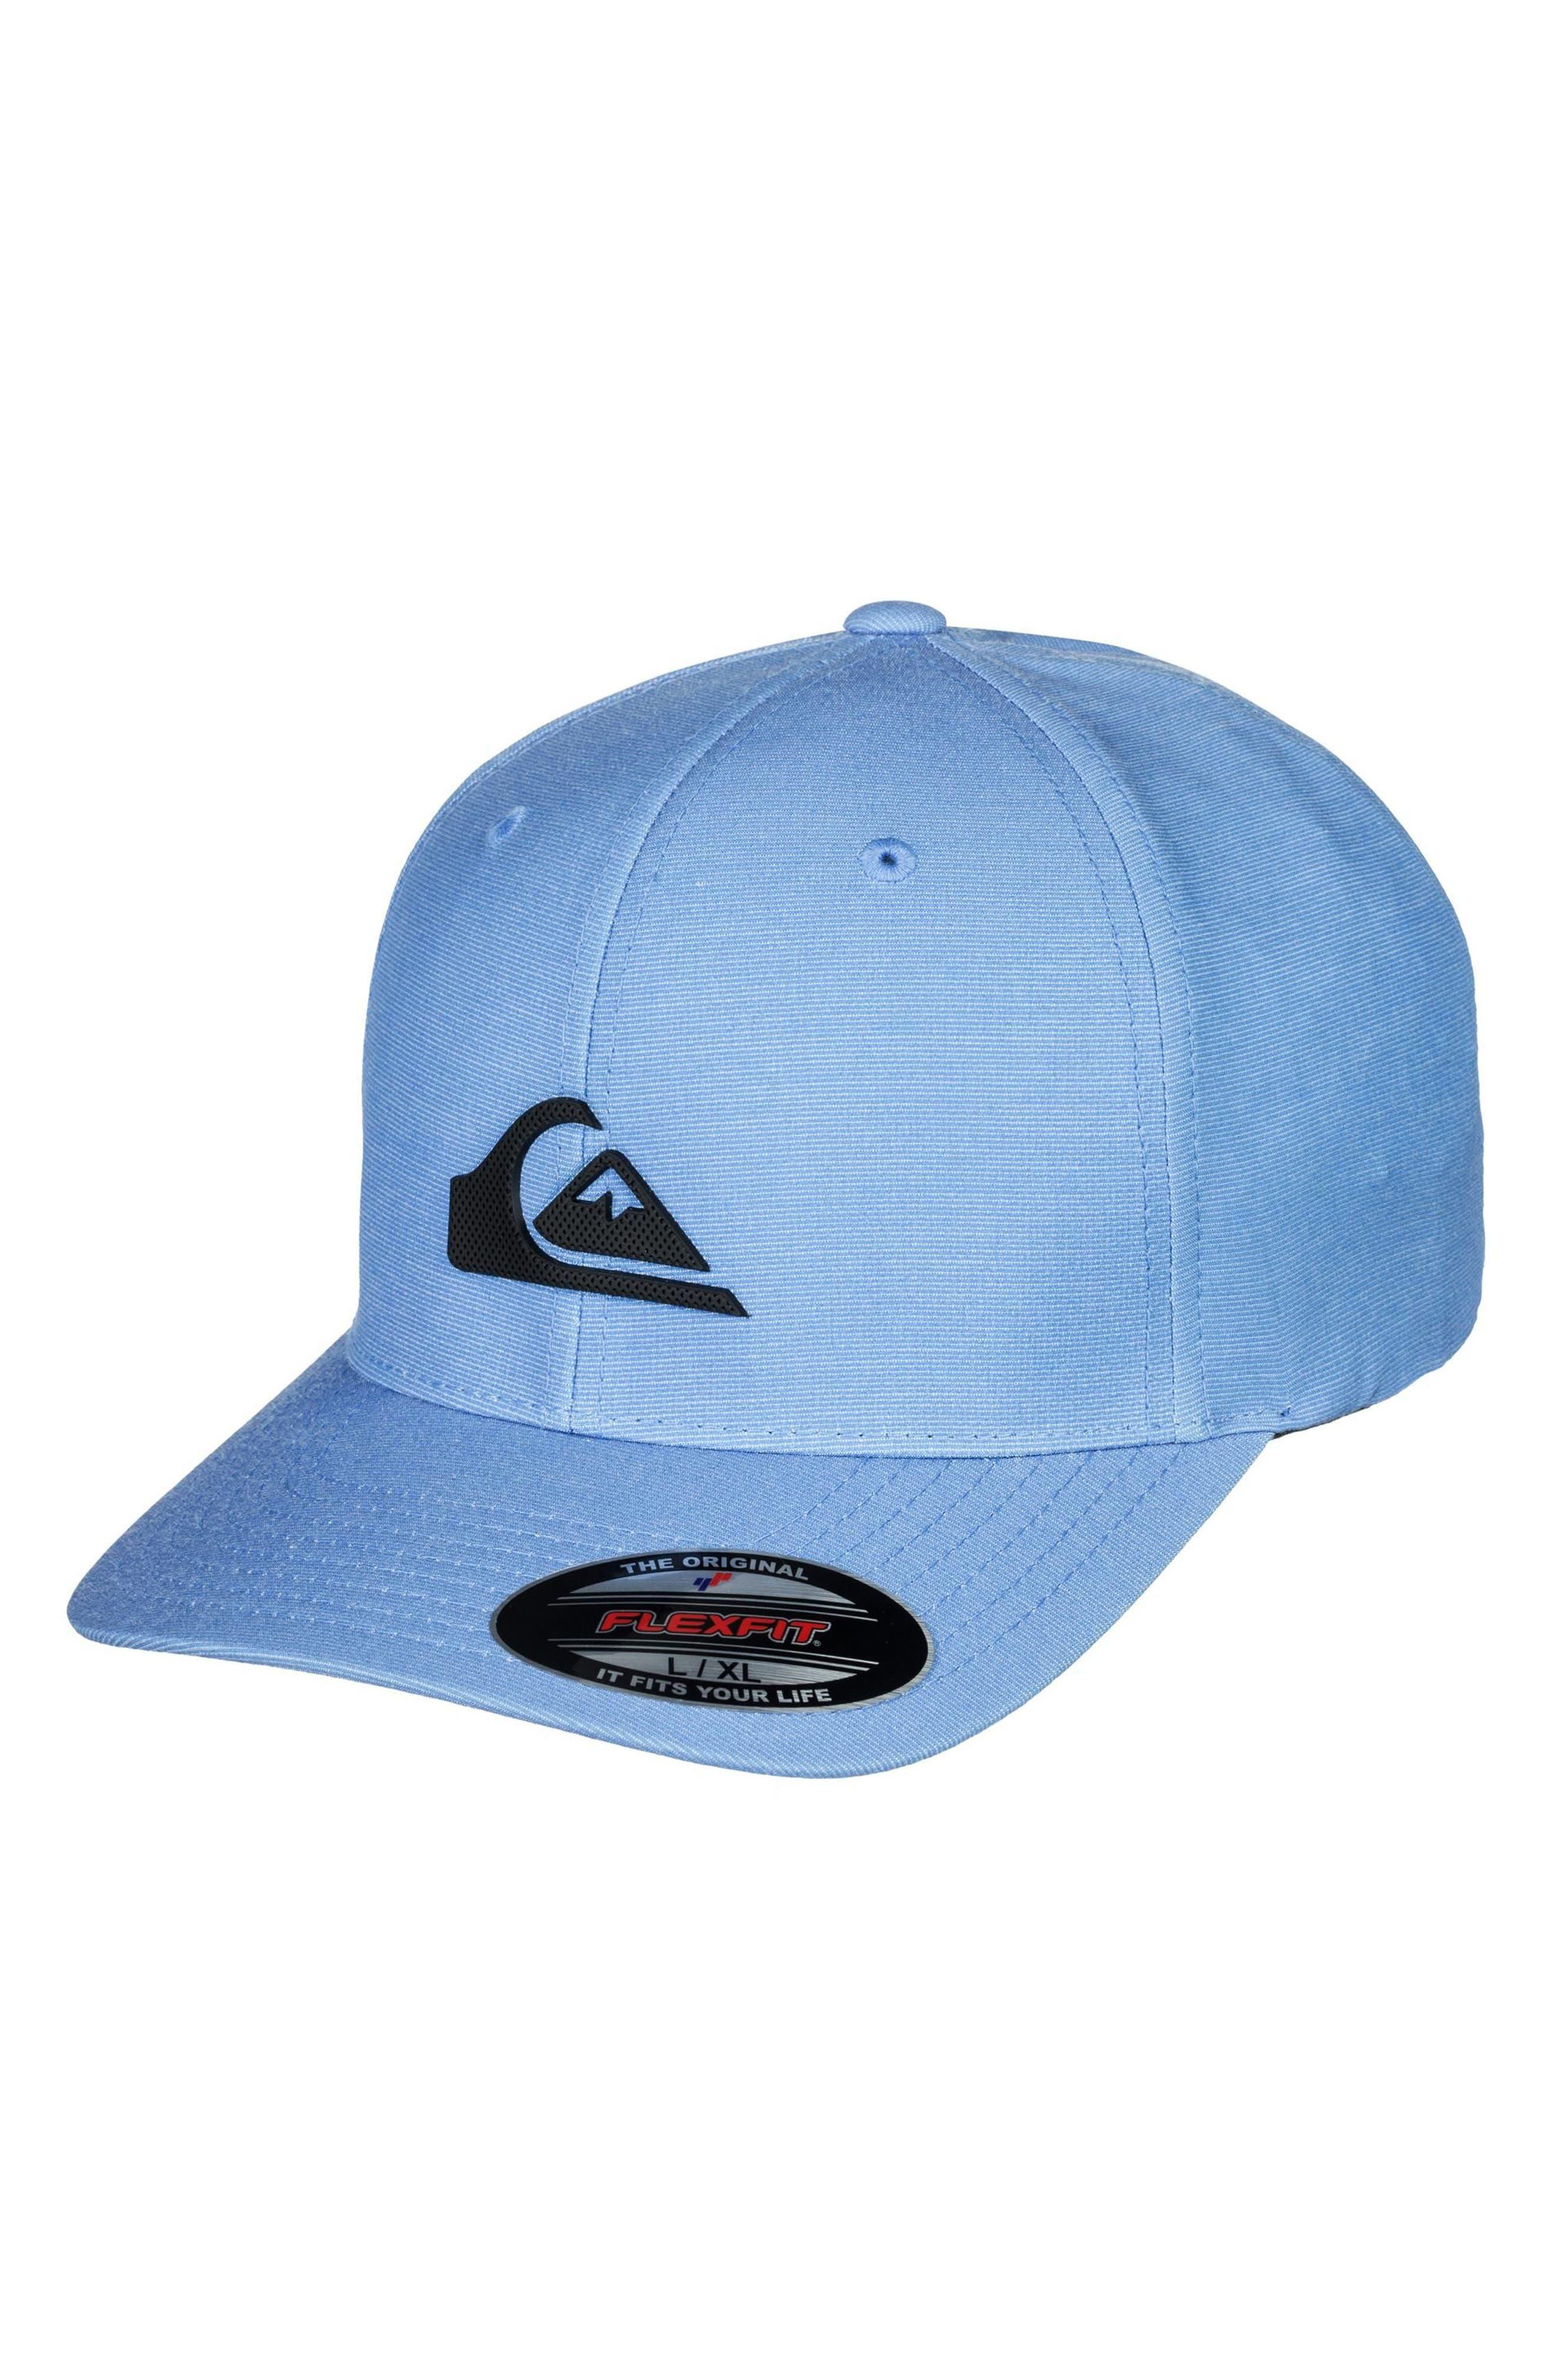 4b6230fb3fa09 ... free shipping quiksilver texturizer flexfit ball cap c6a9c f7e81